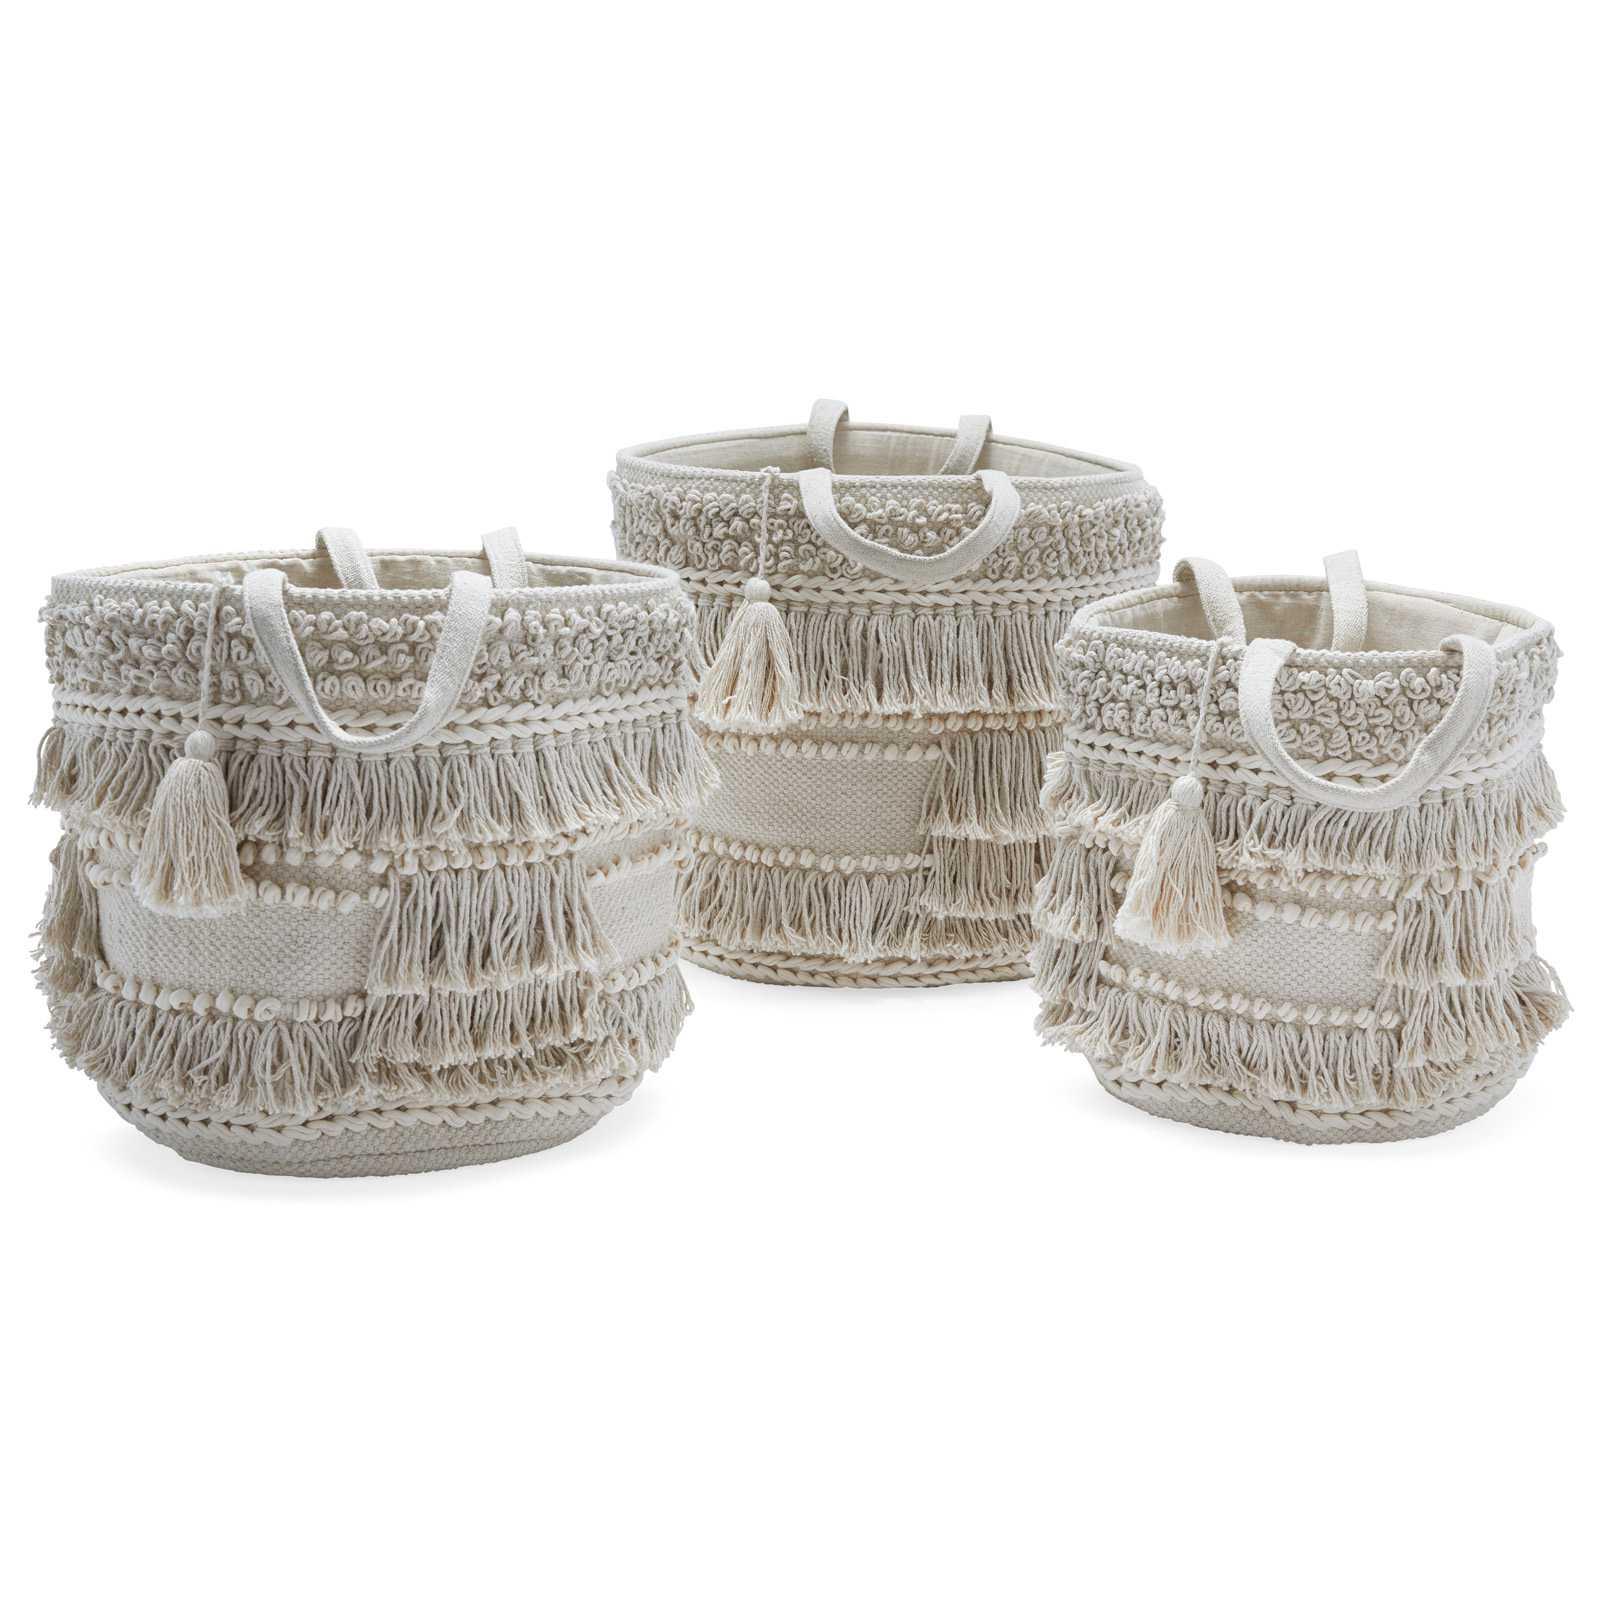 Drew Barrymore Hand Woven Macrame 3 Piece Basket Set